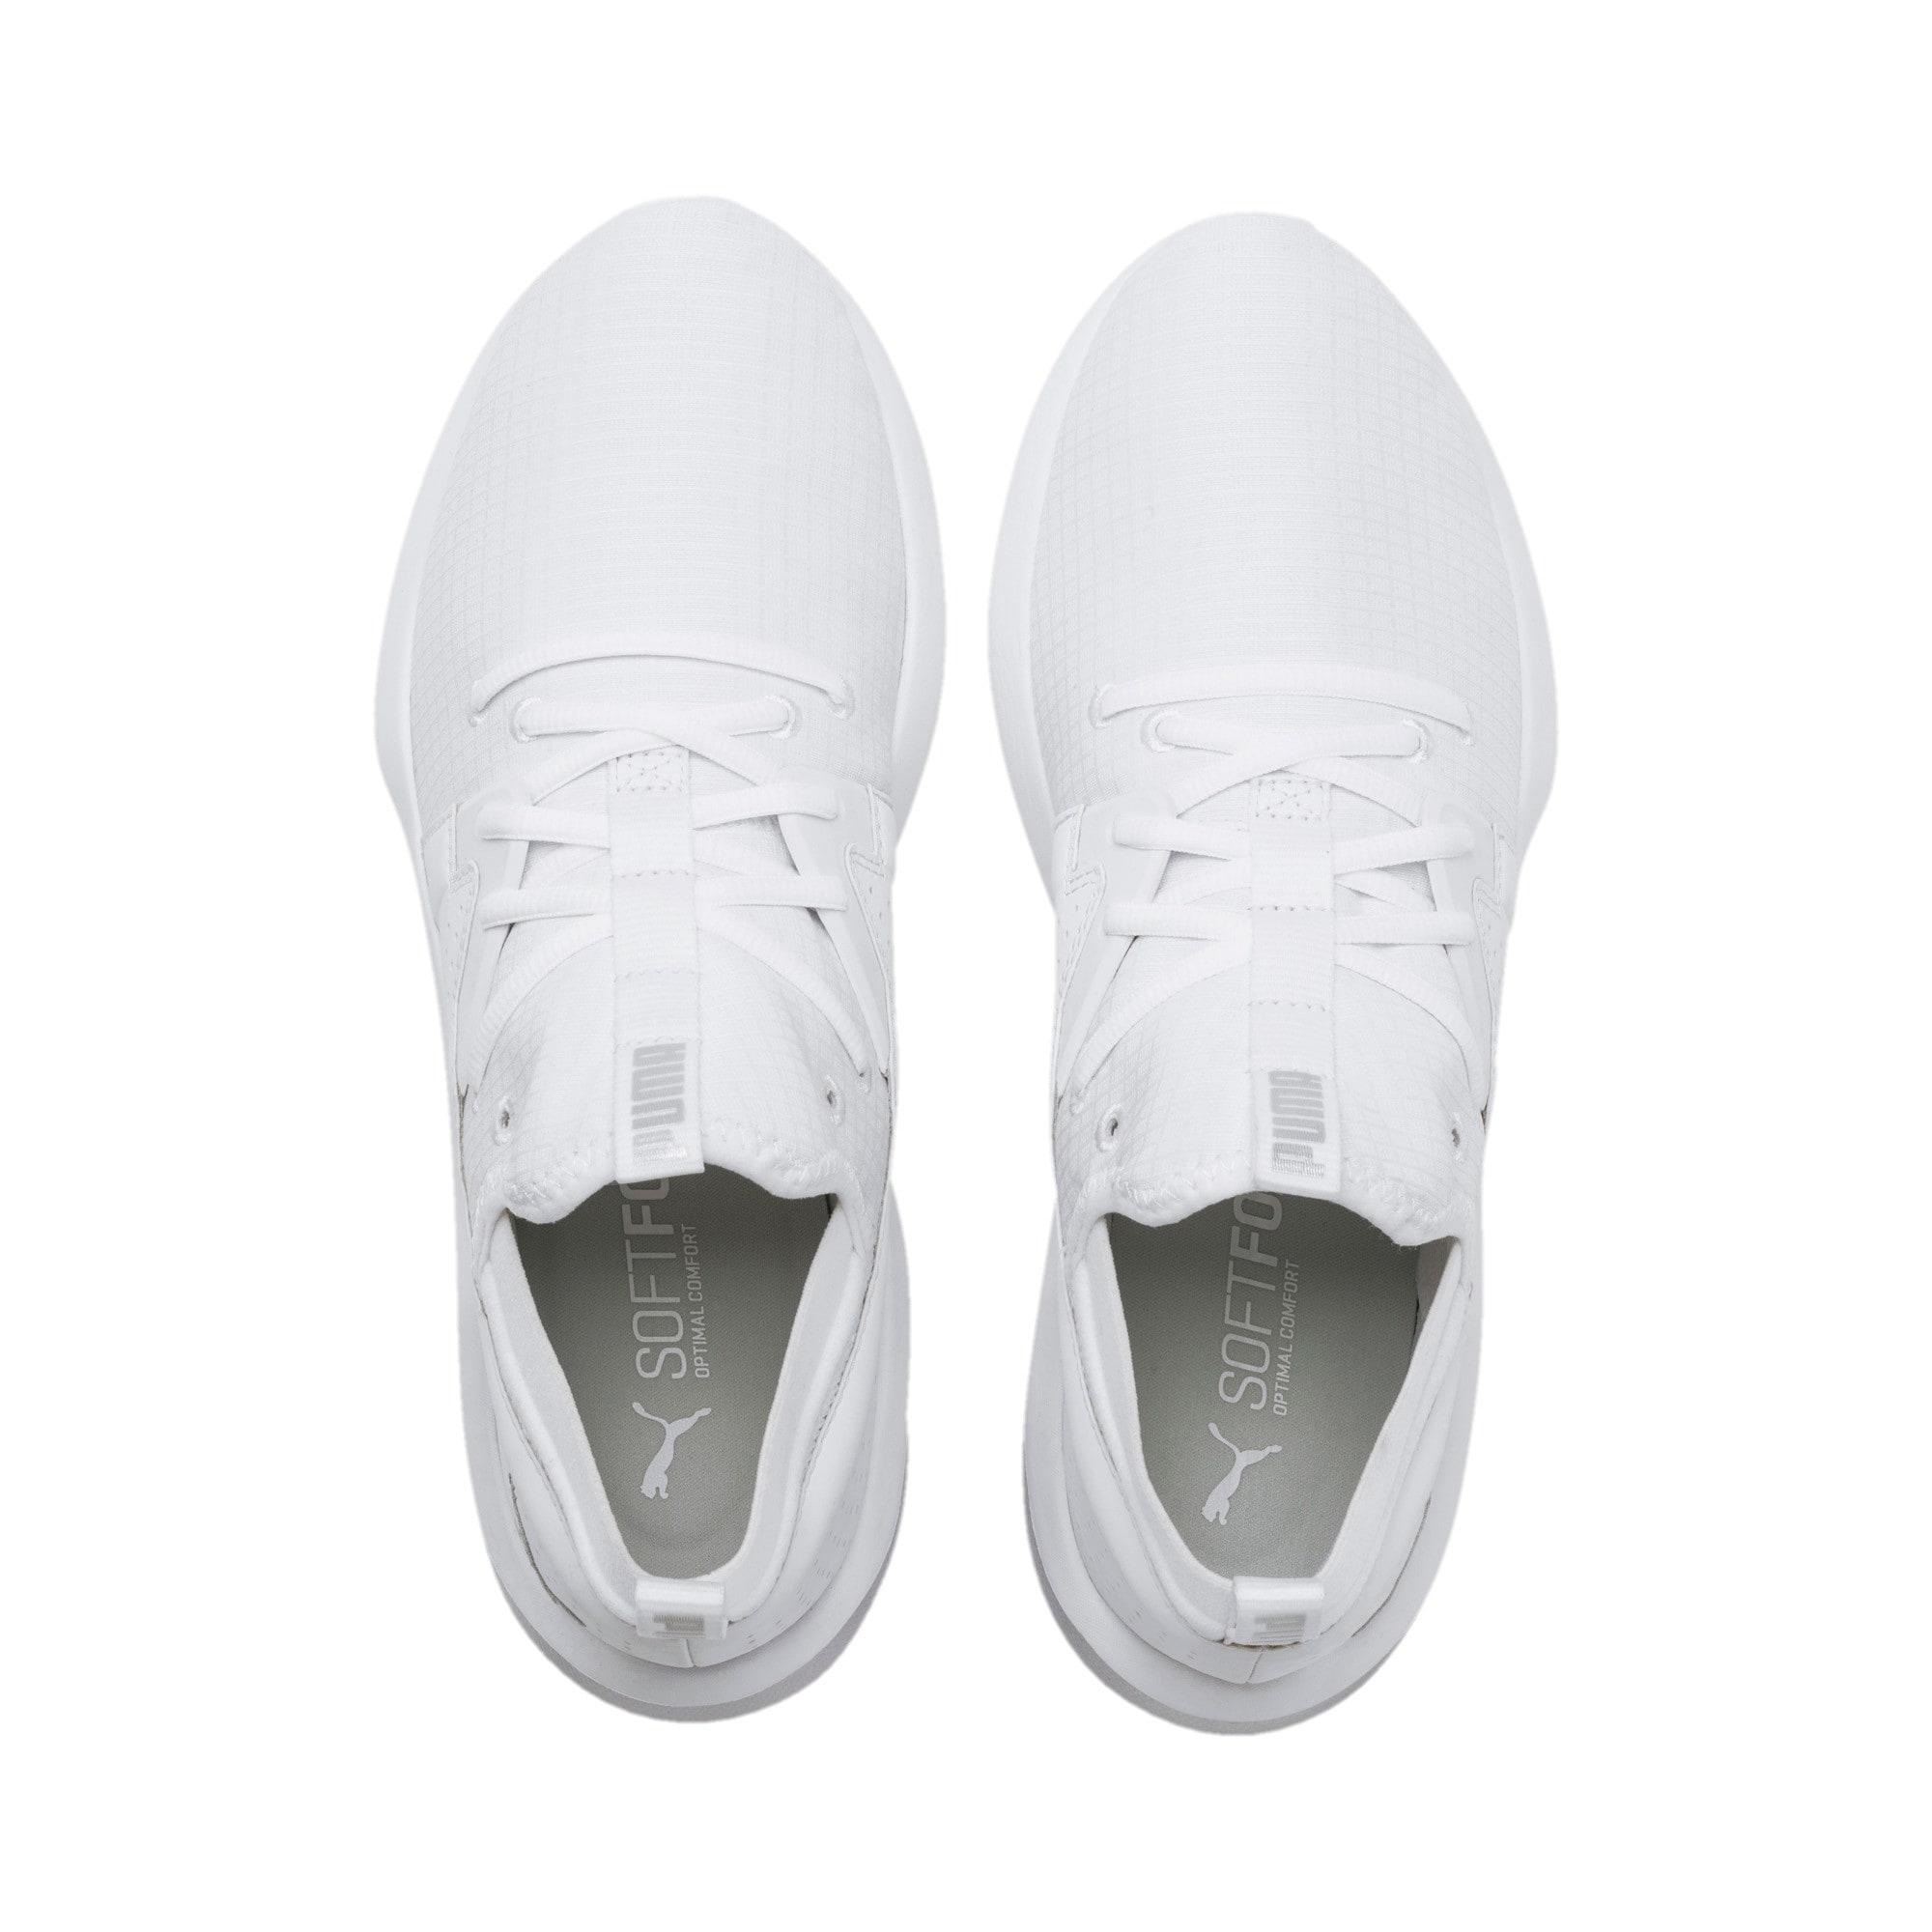 Thumbnail 4 of Emergence Lights Men's Running Shoes, Puma White-Puma Silver, medium-IND